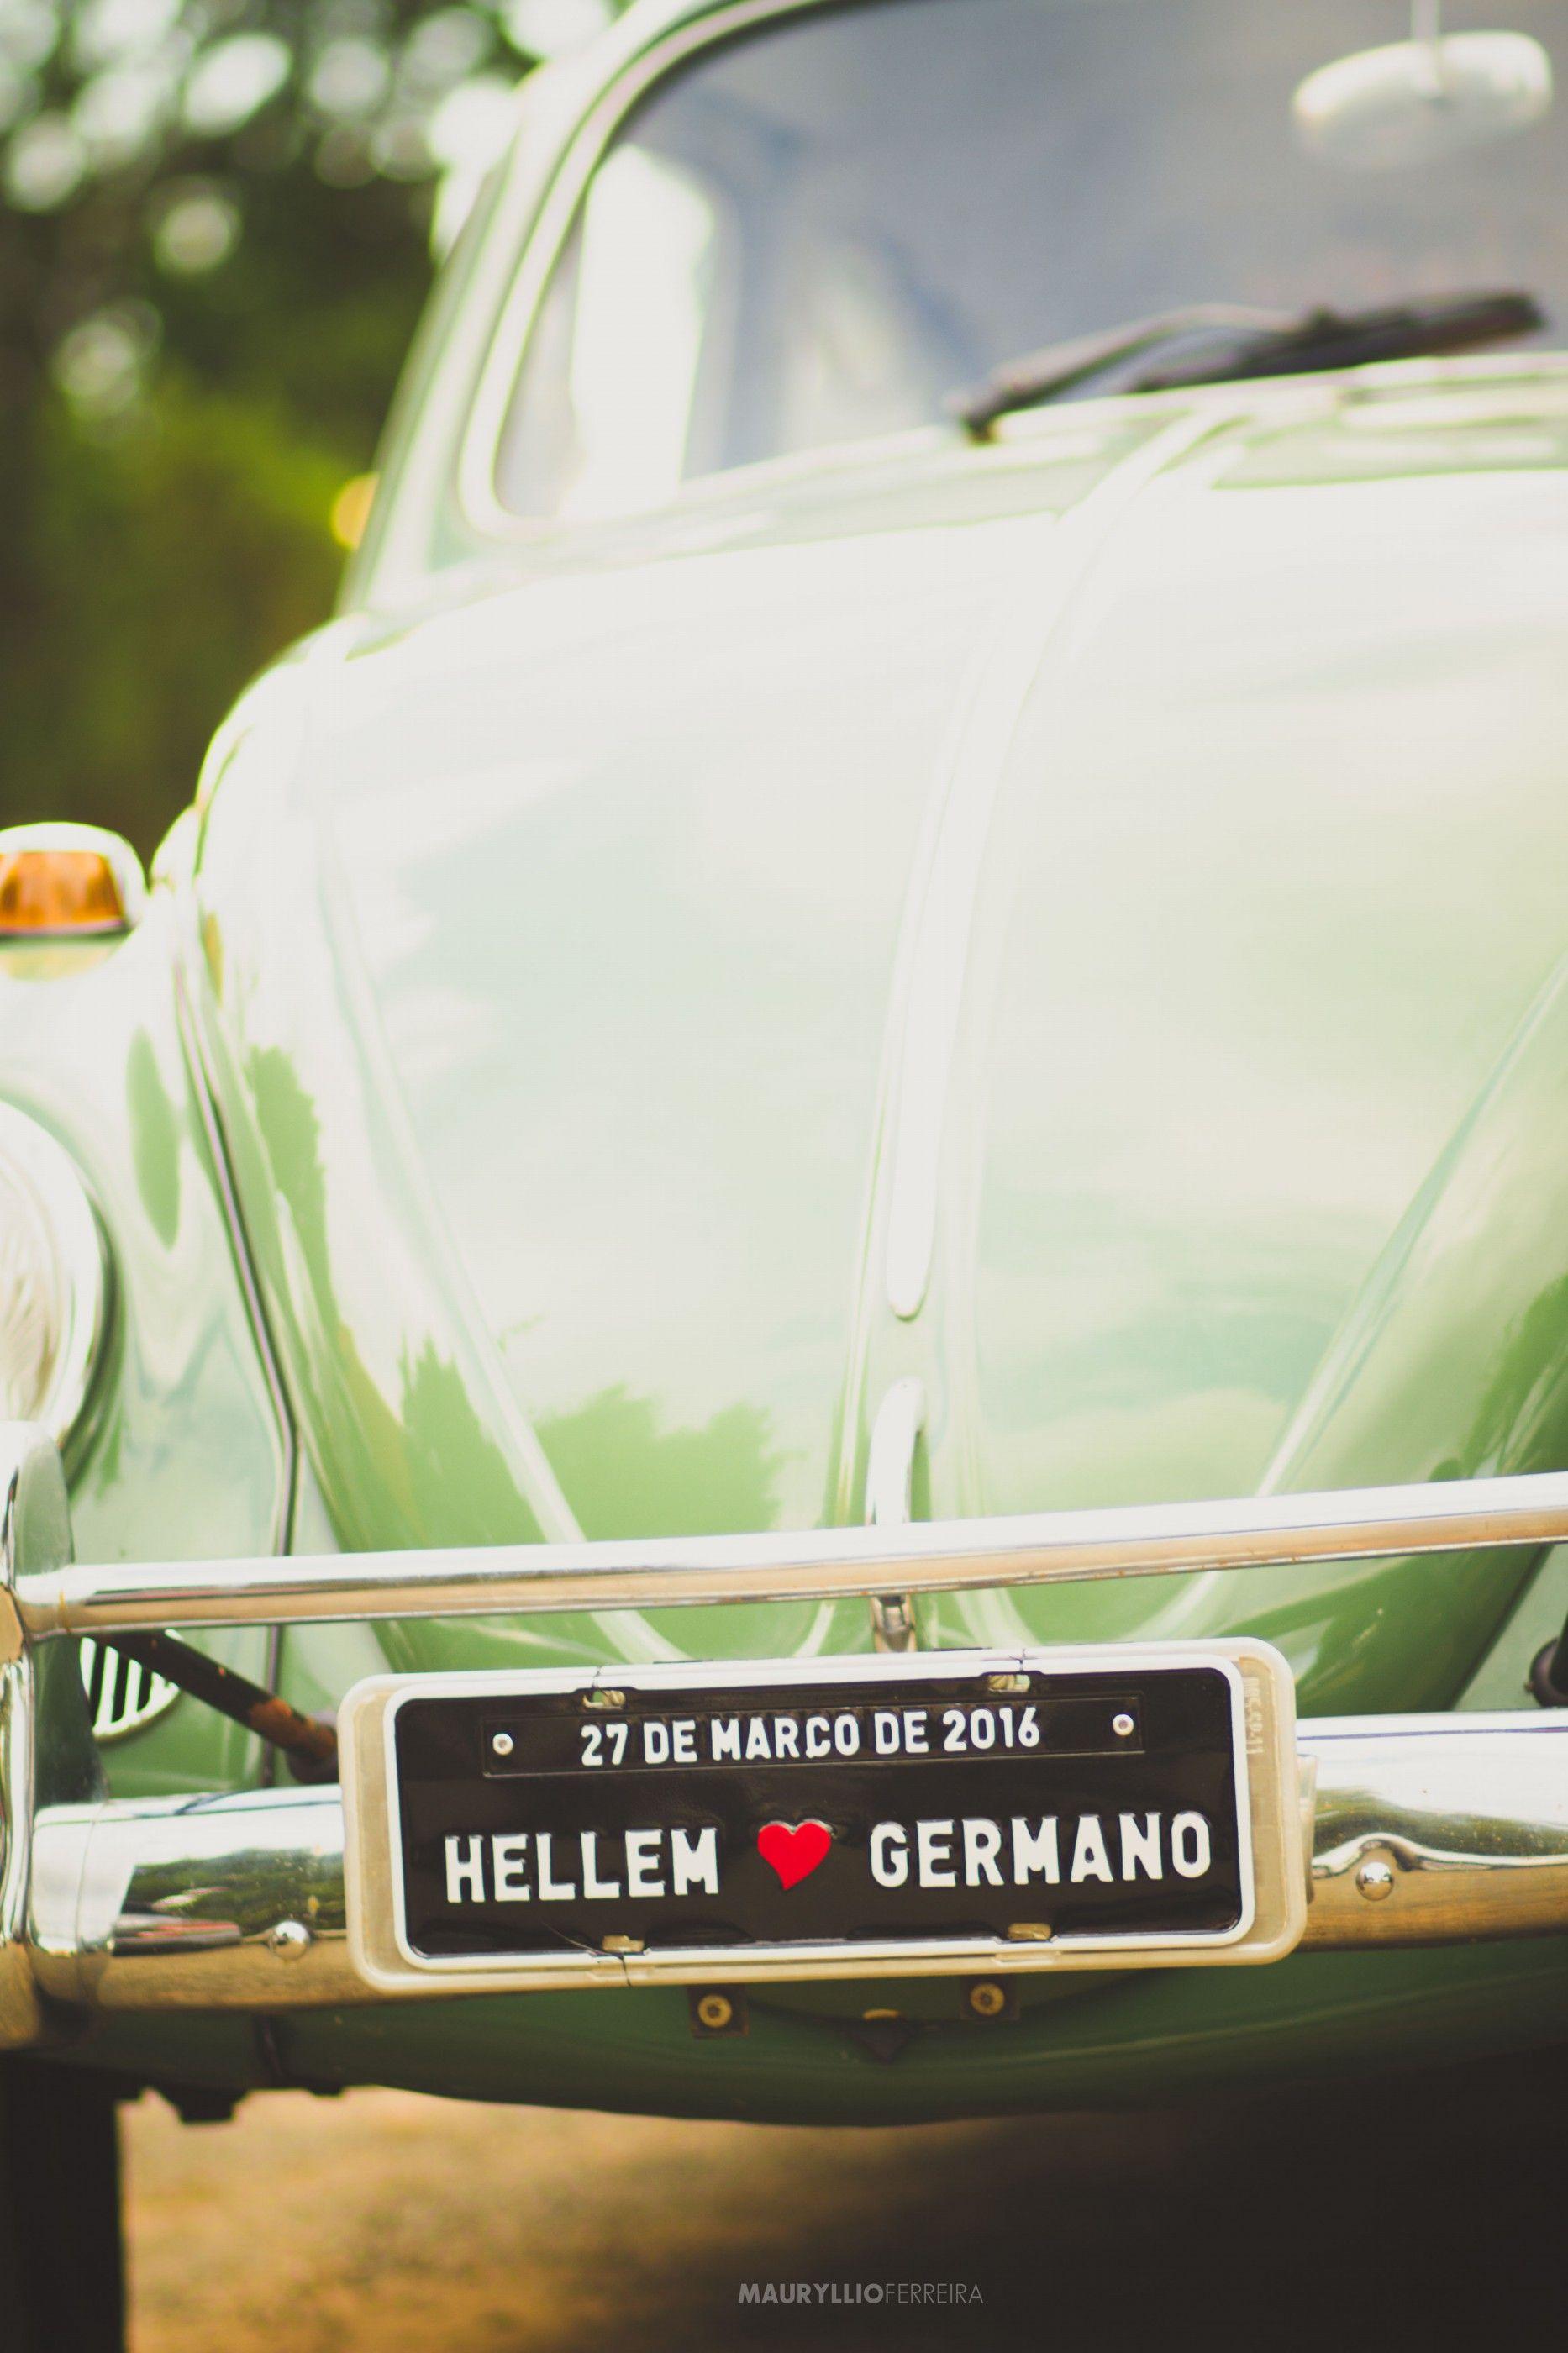 Casamento Hellem <3 Germano - 27/03/2016